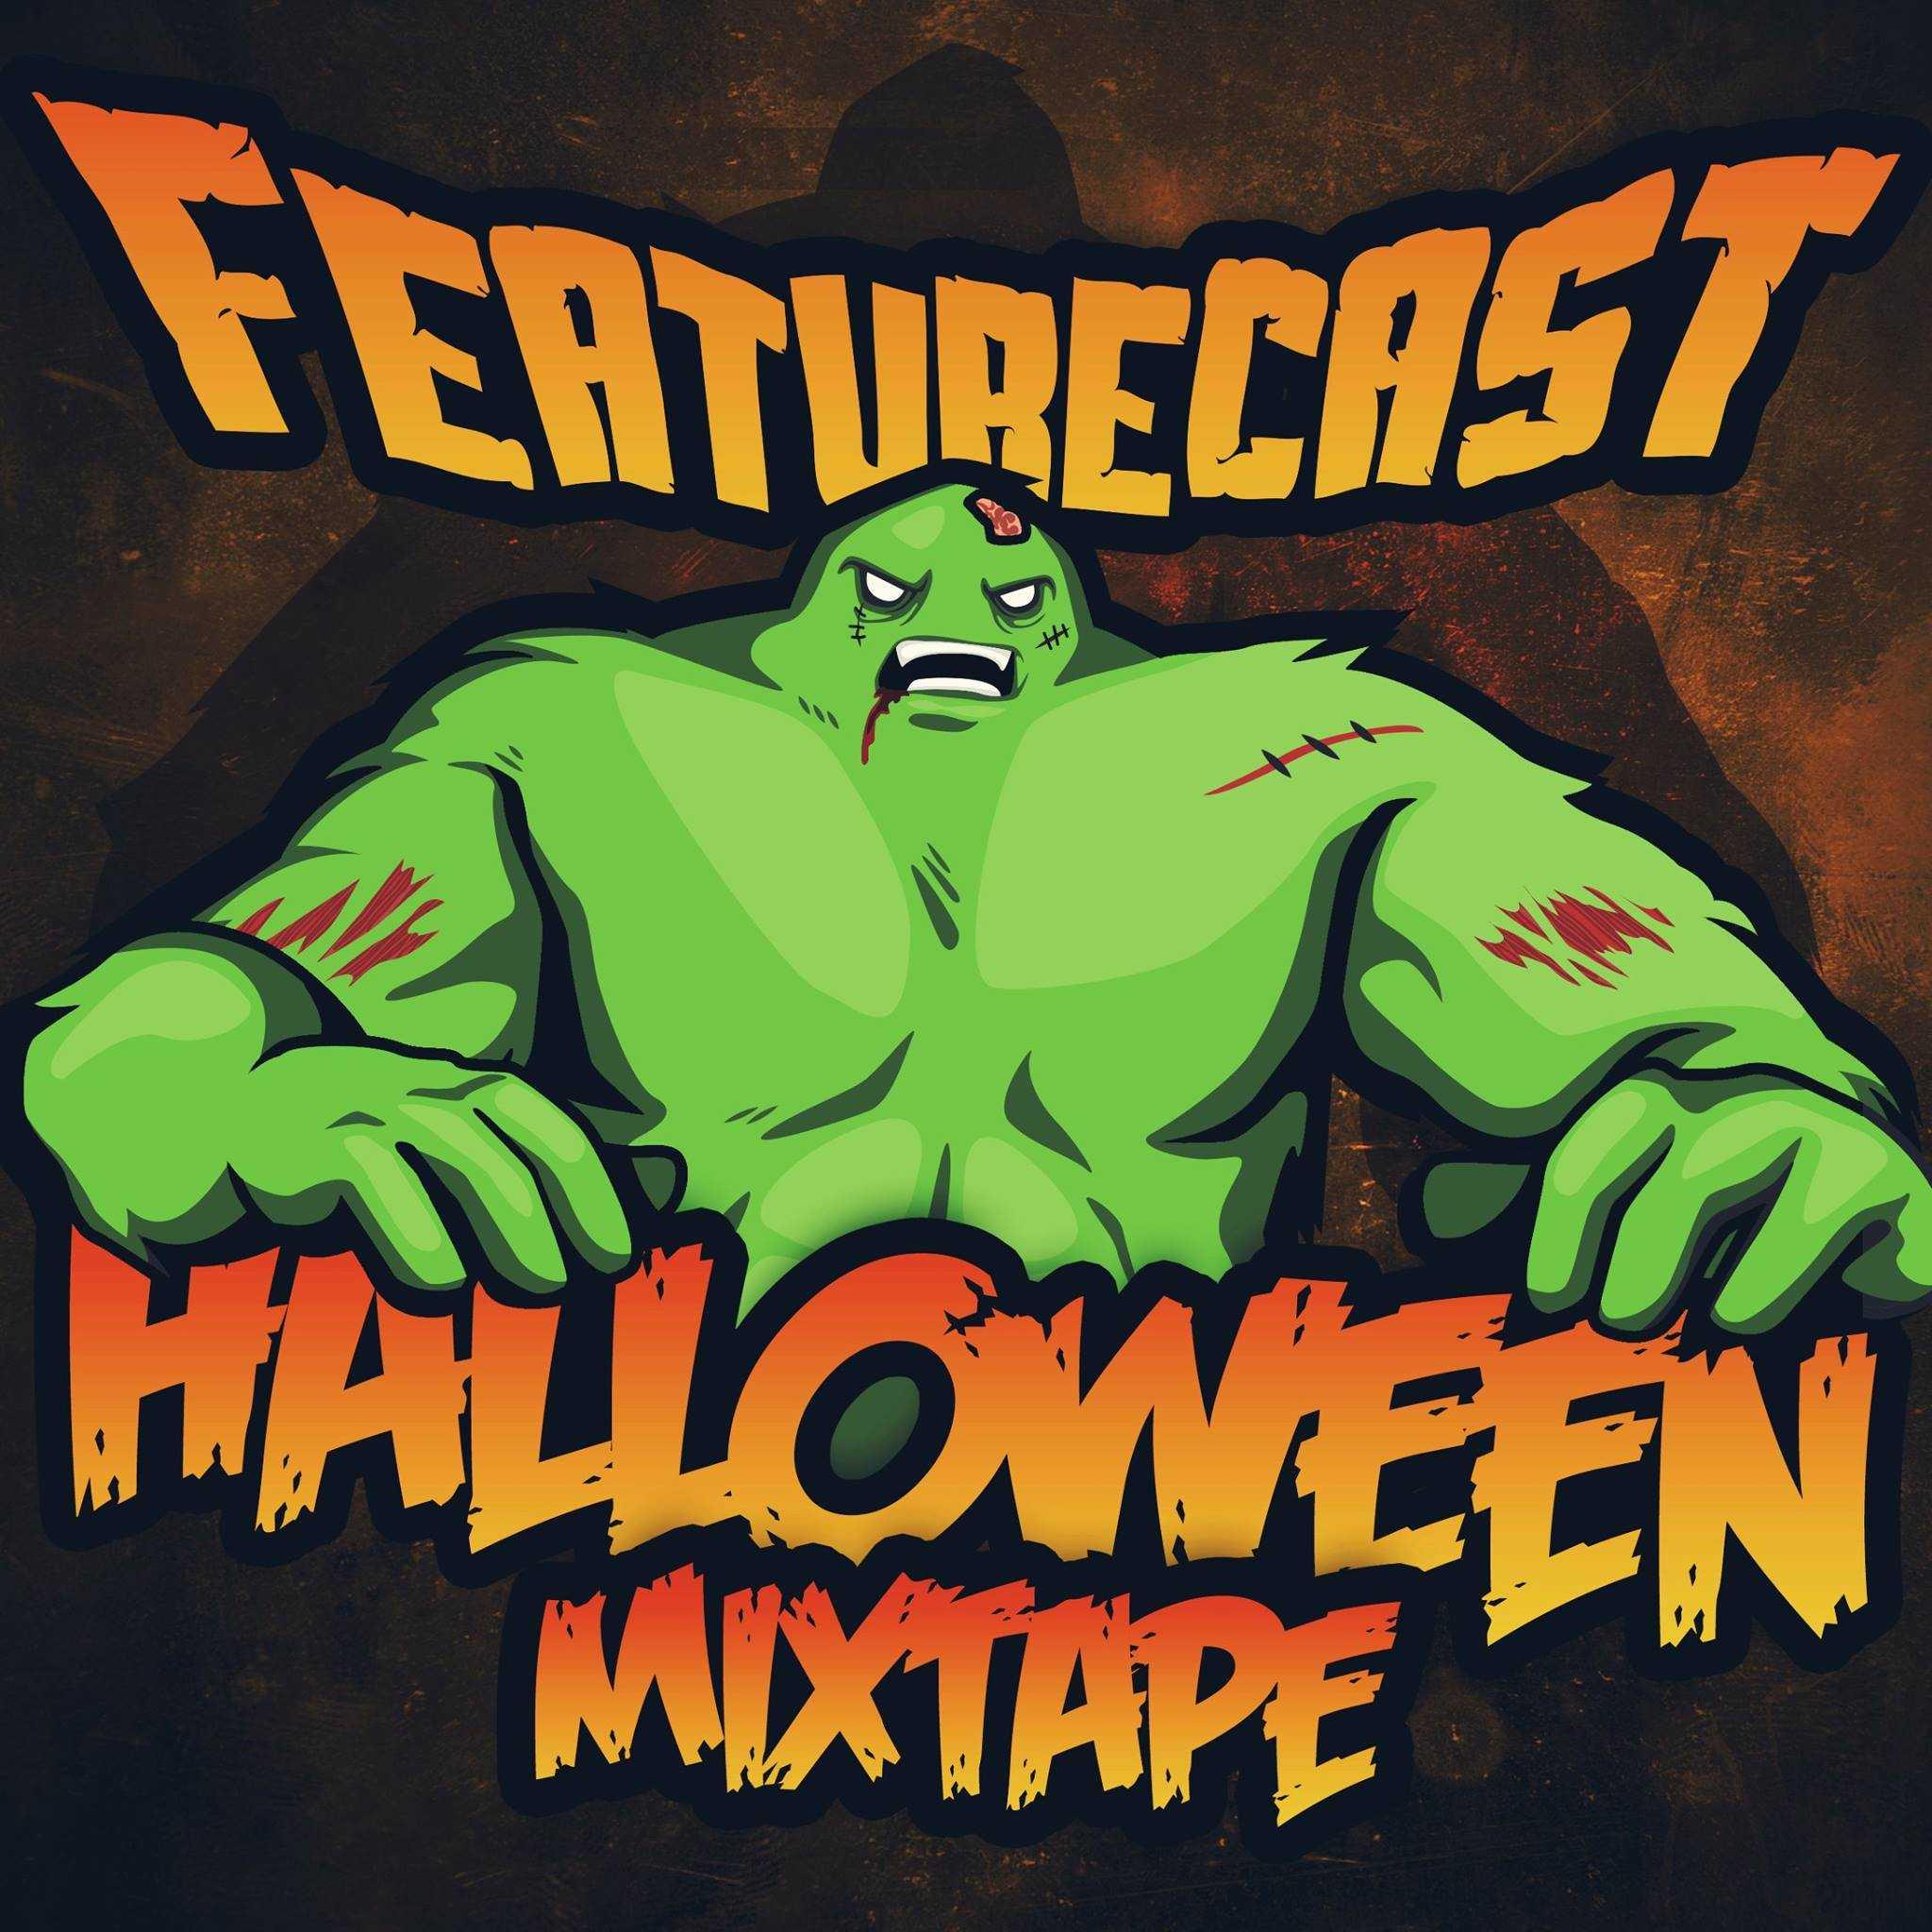 featurecast - halloween mixtape 2016 - breakzlinkz